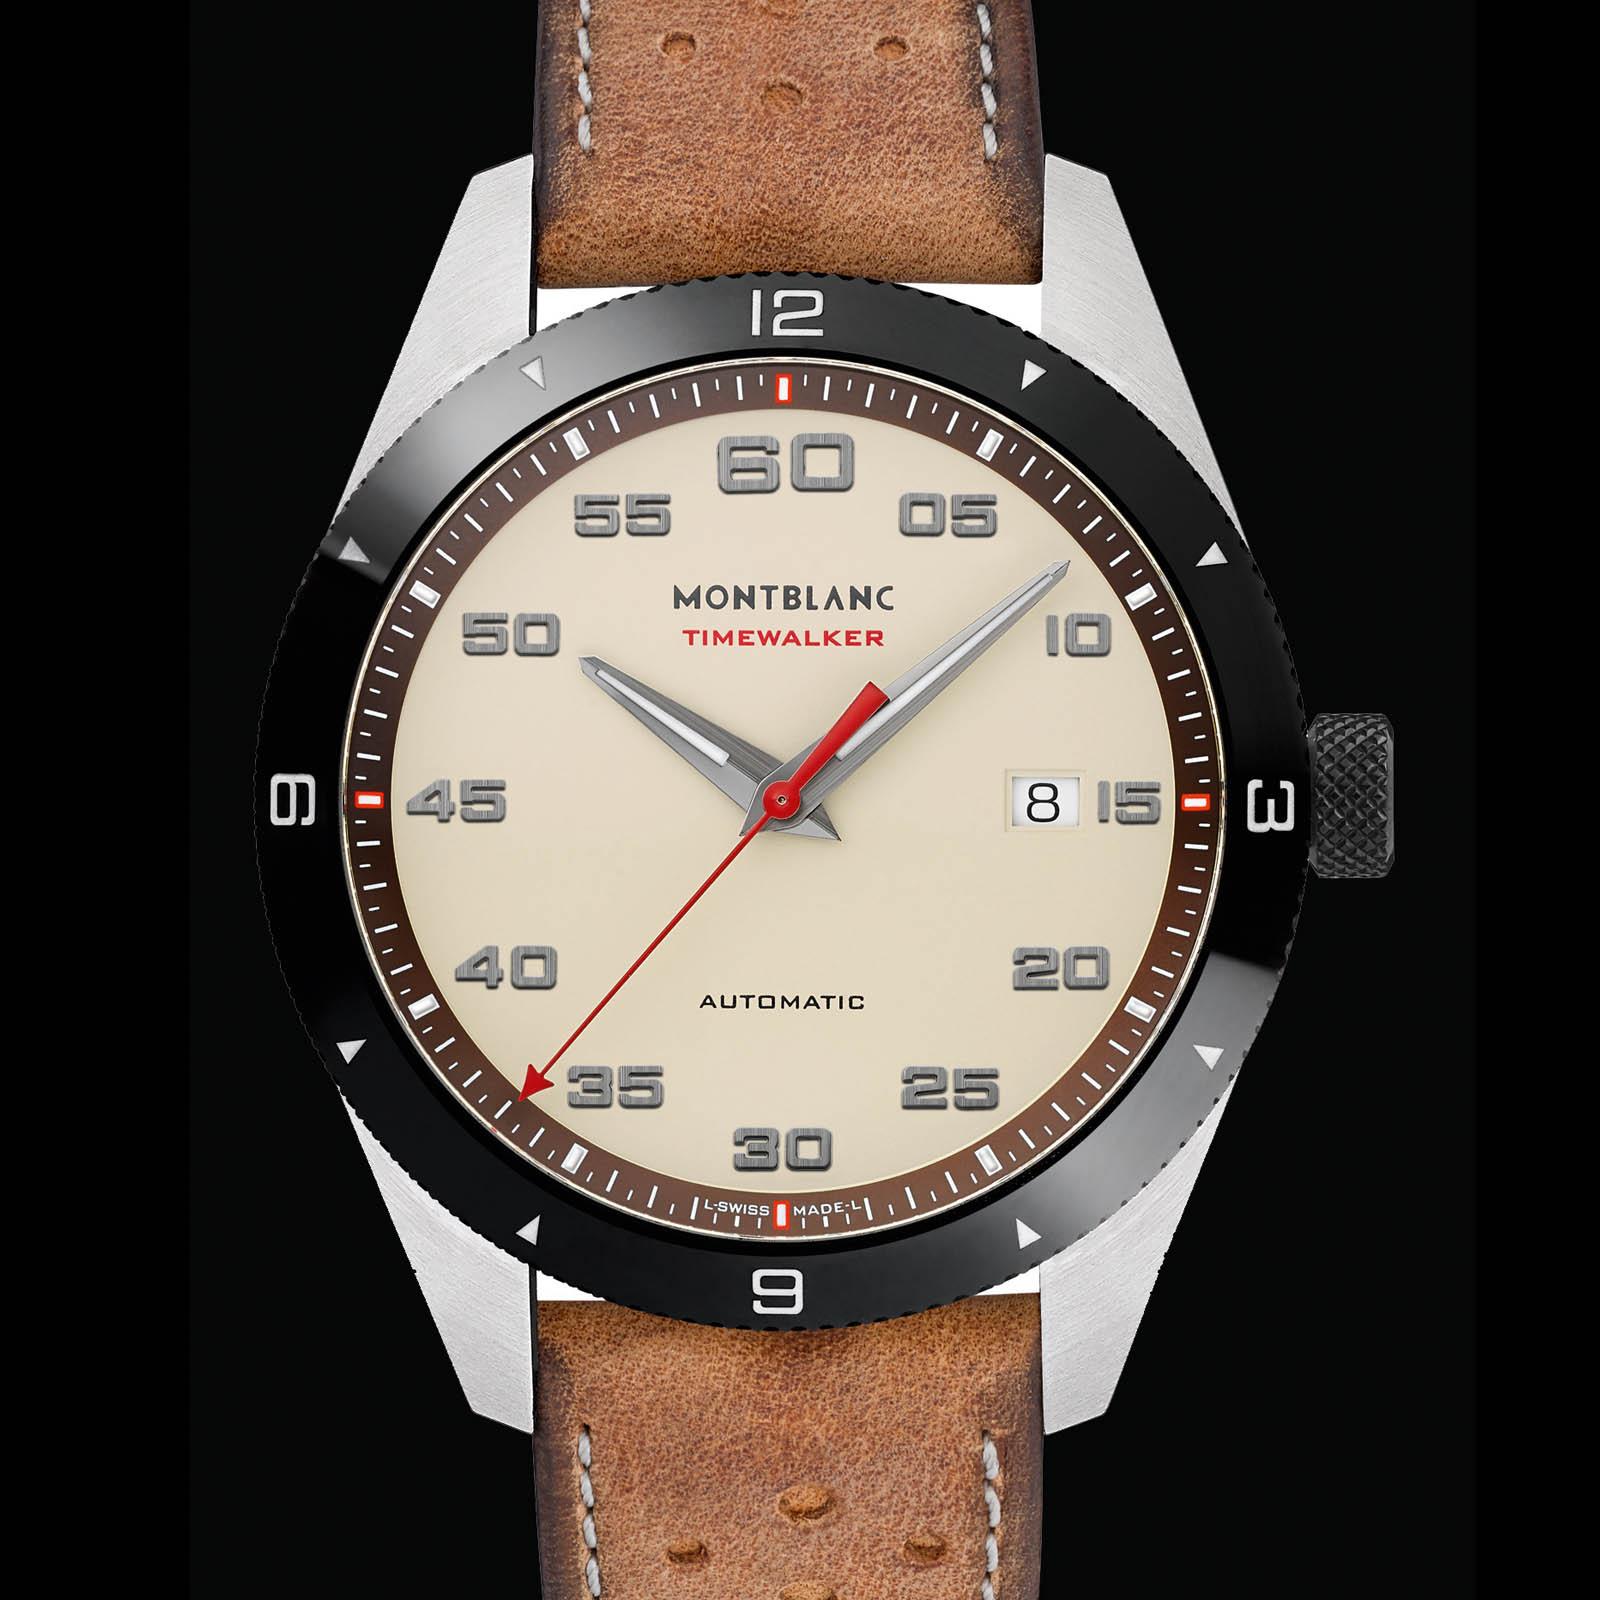 Montblanc TimeWalker Date Automatic ref. 118494